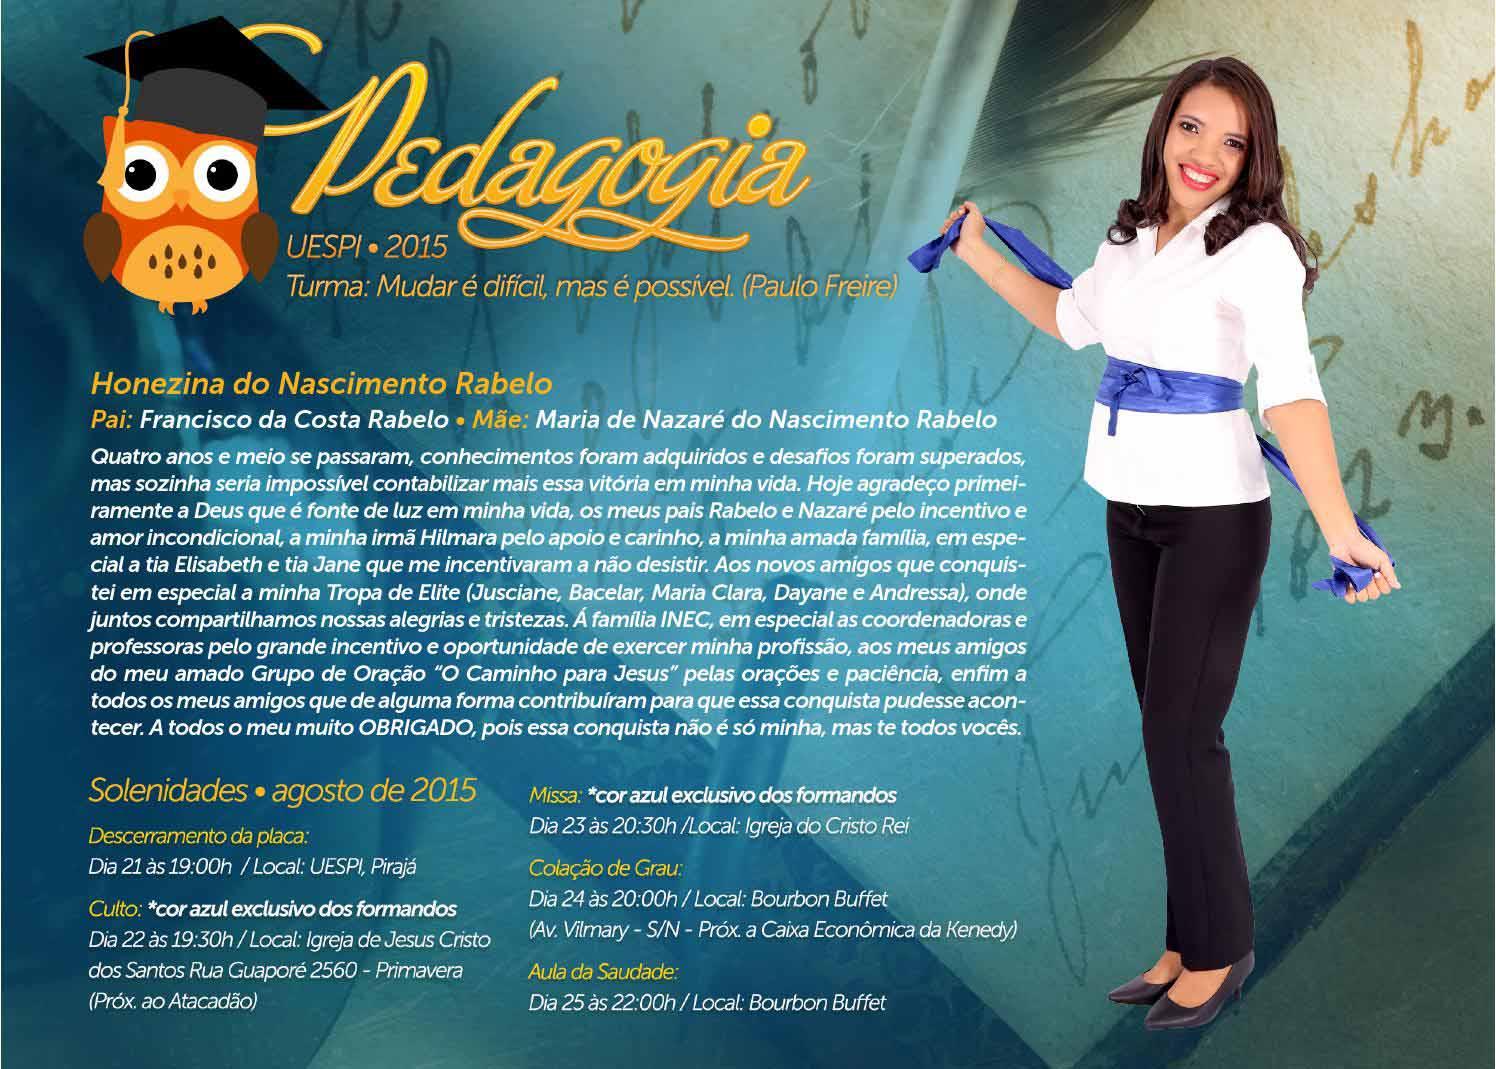 convite para formatura de pedagogia